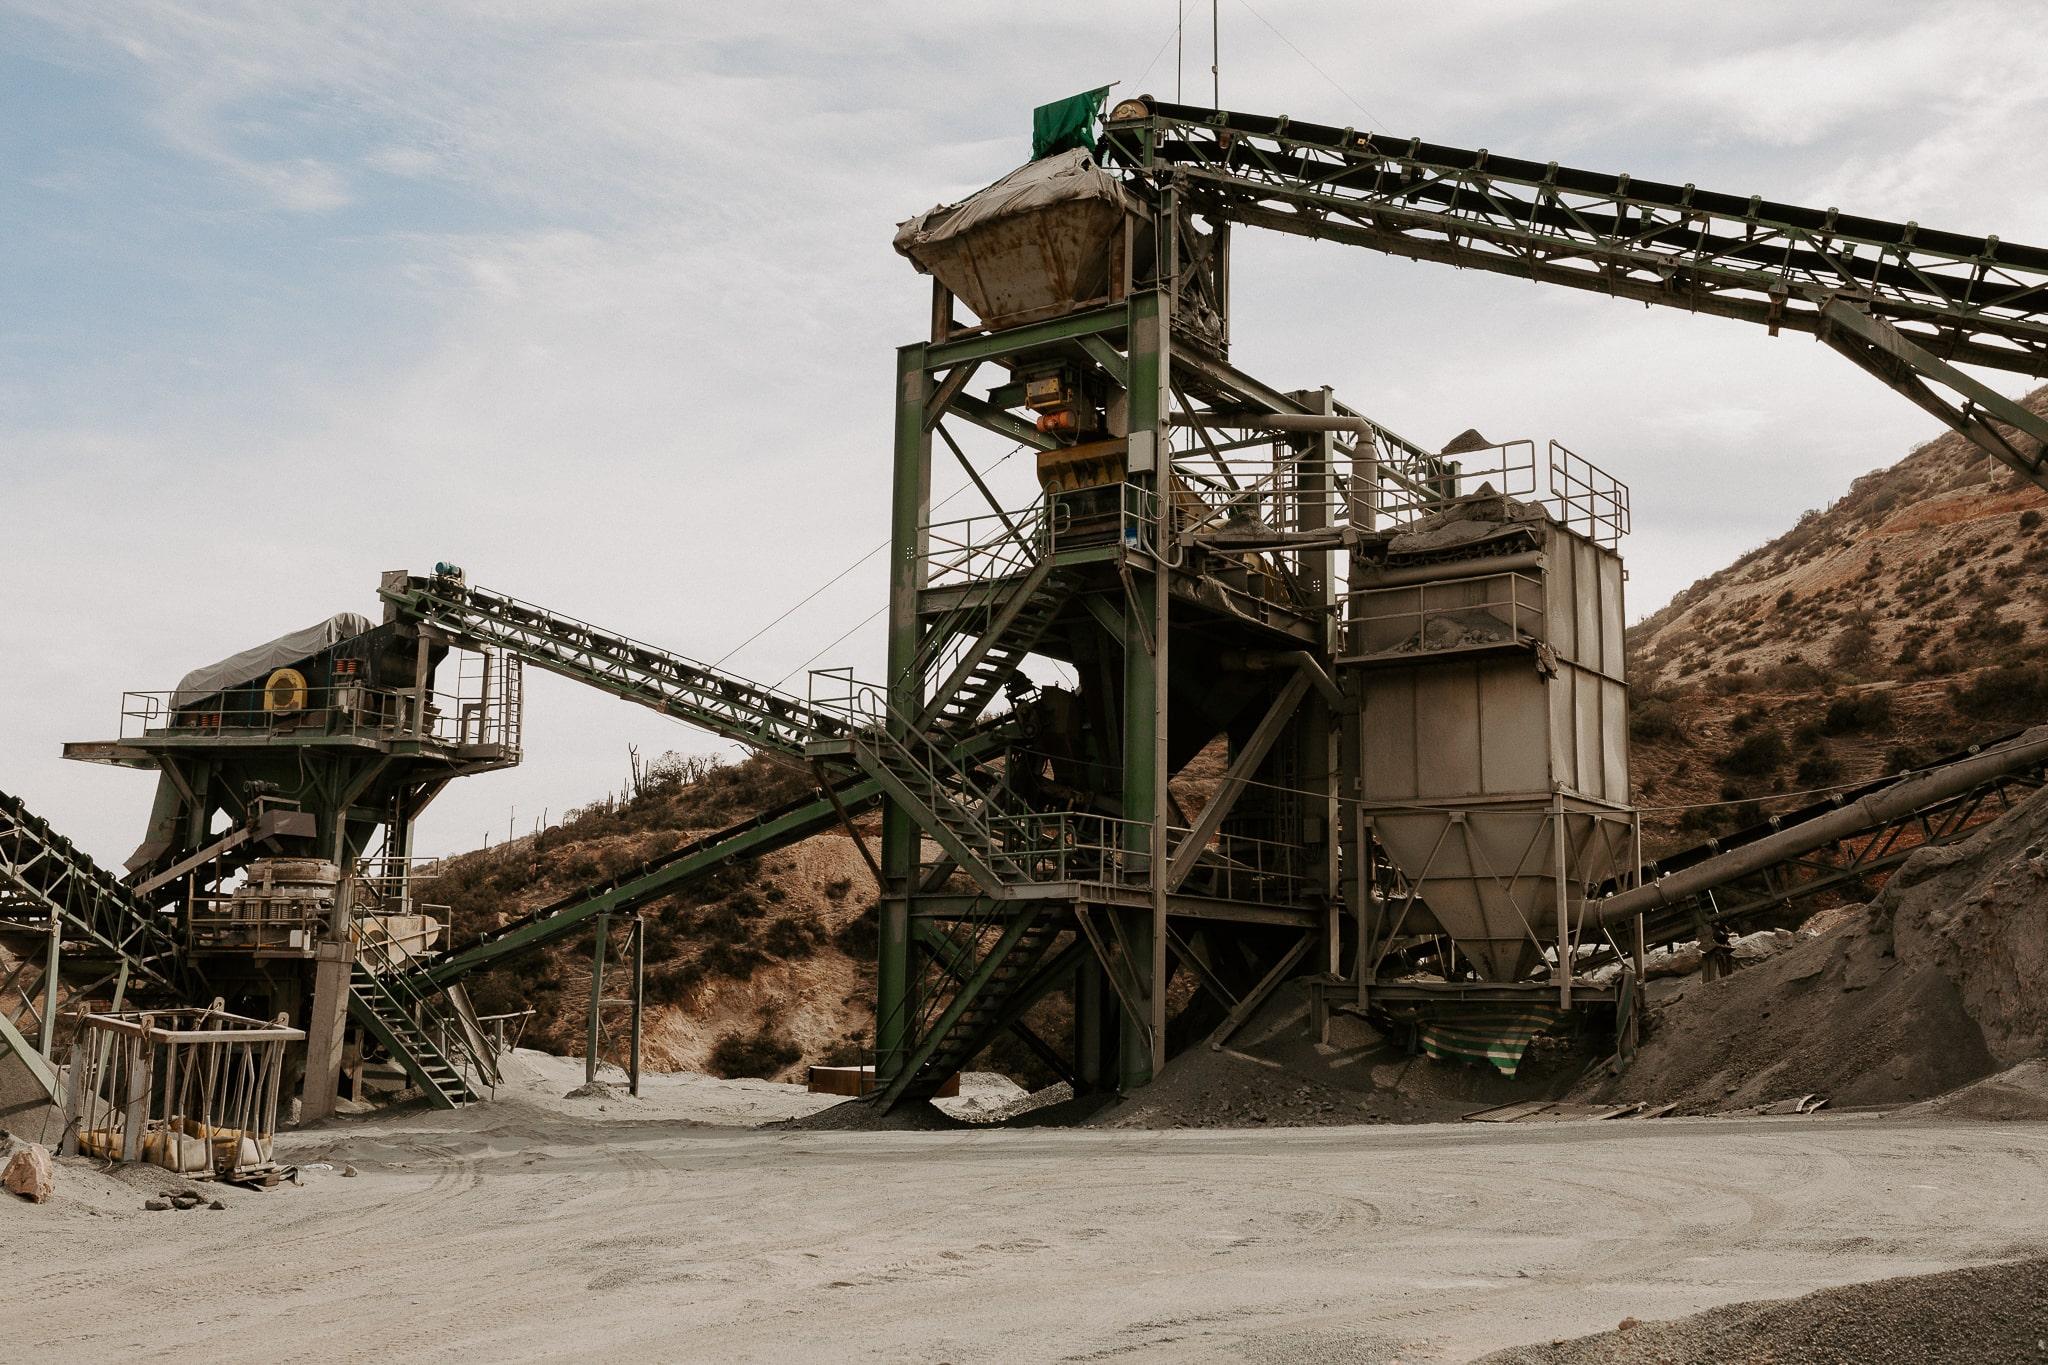 san-pedro-mineria-sitio-de-prueba-cnp-5